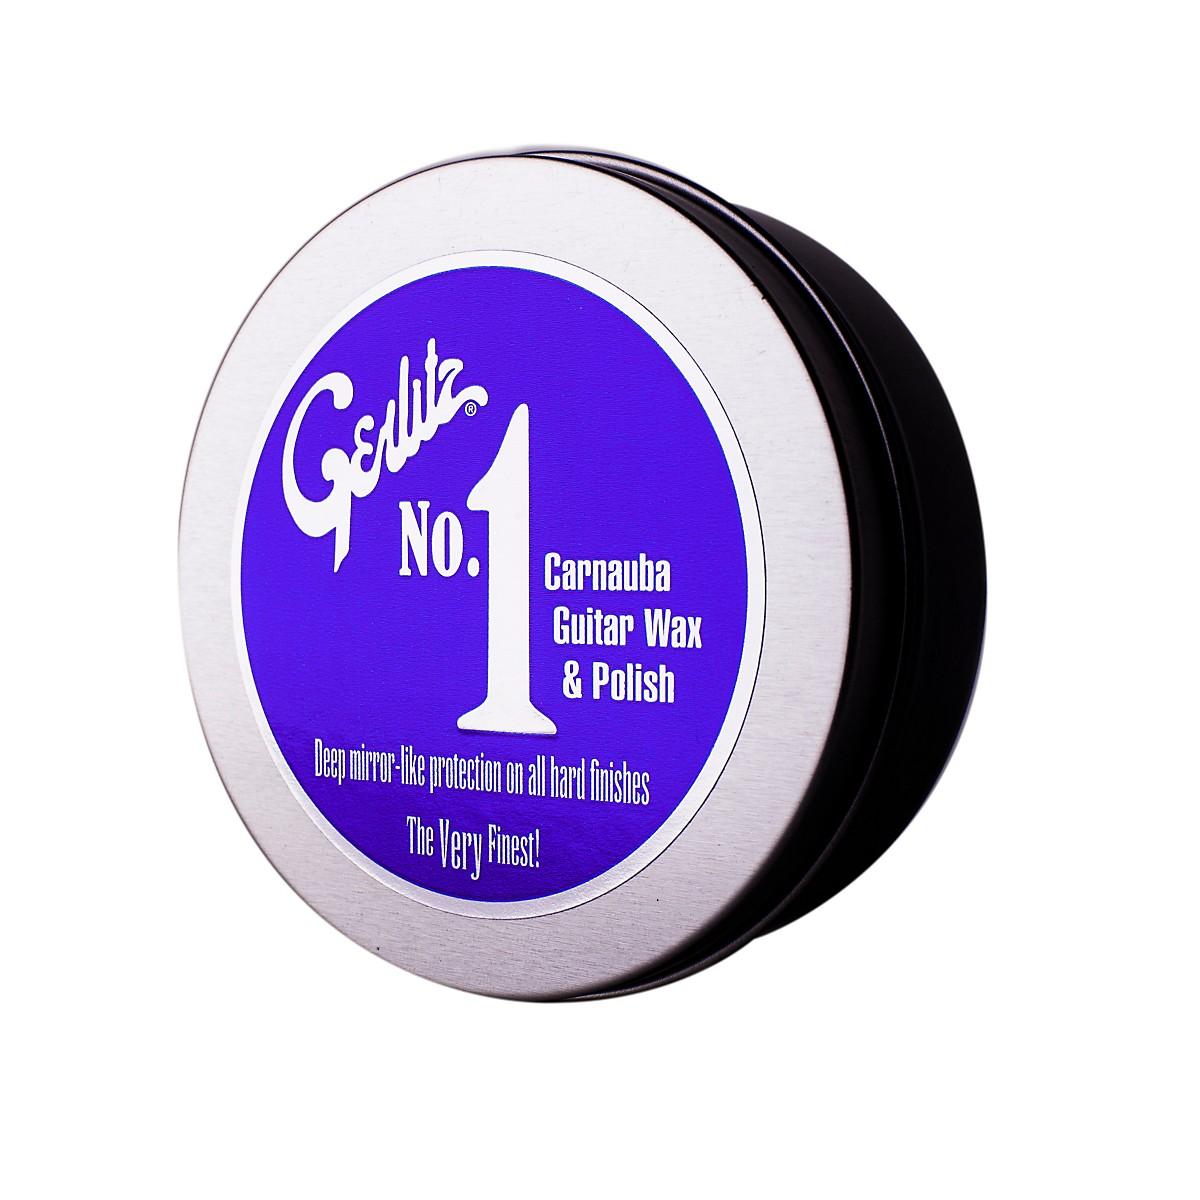 Gerlitz No. 1 Wax